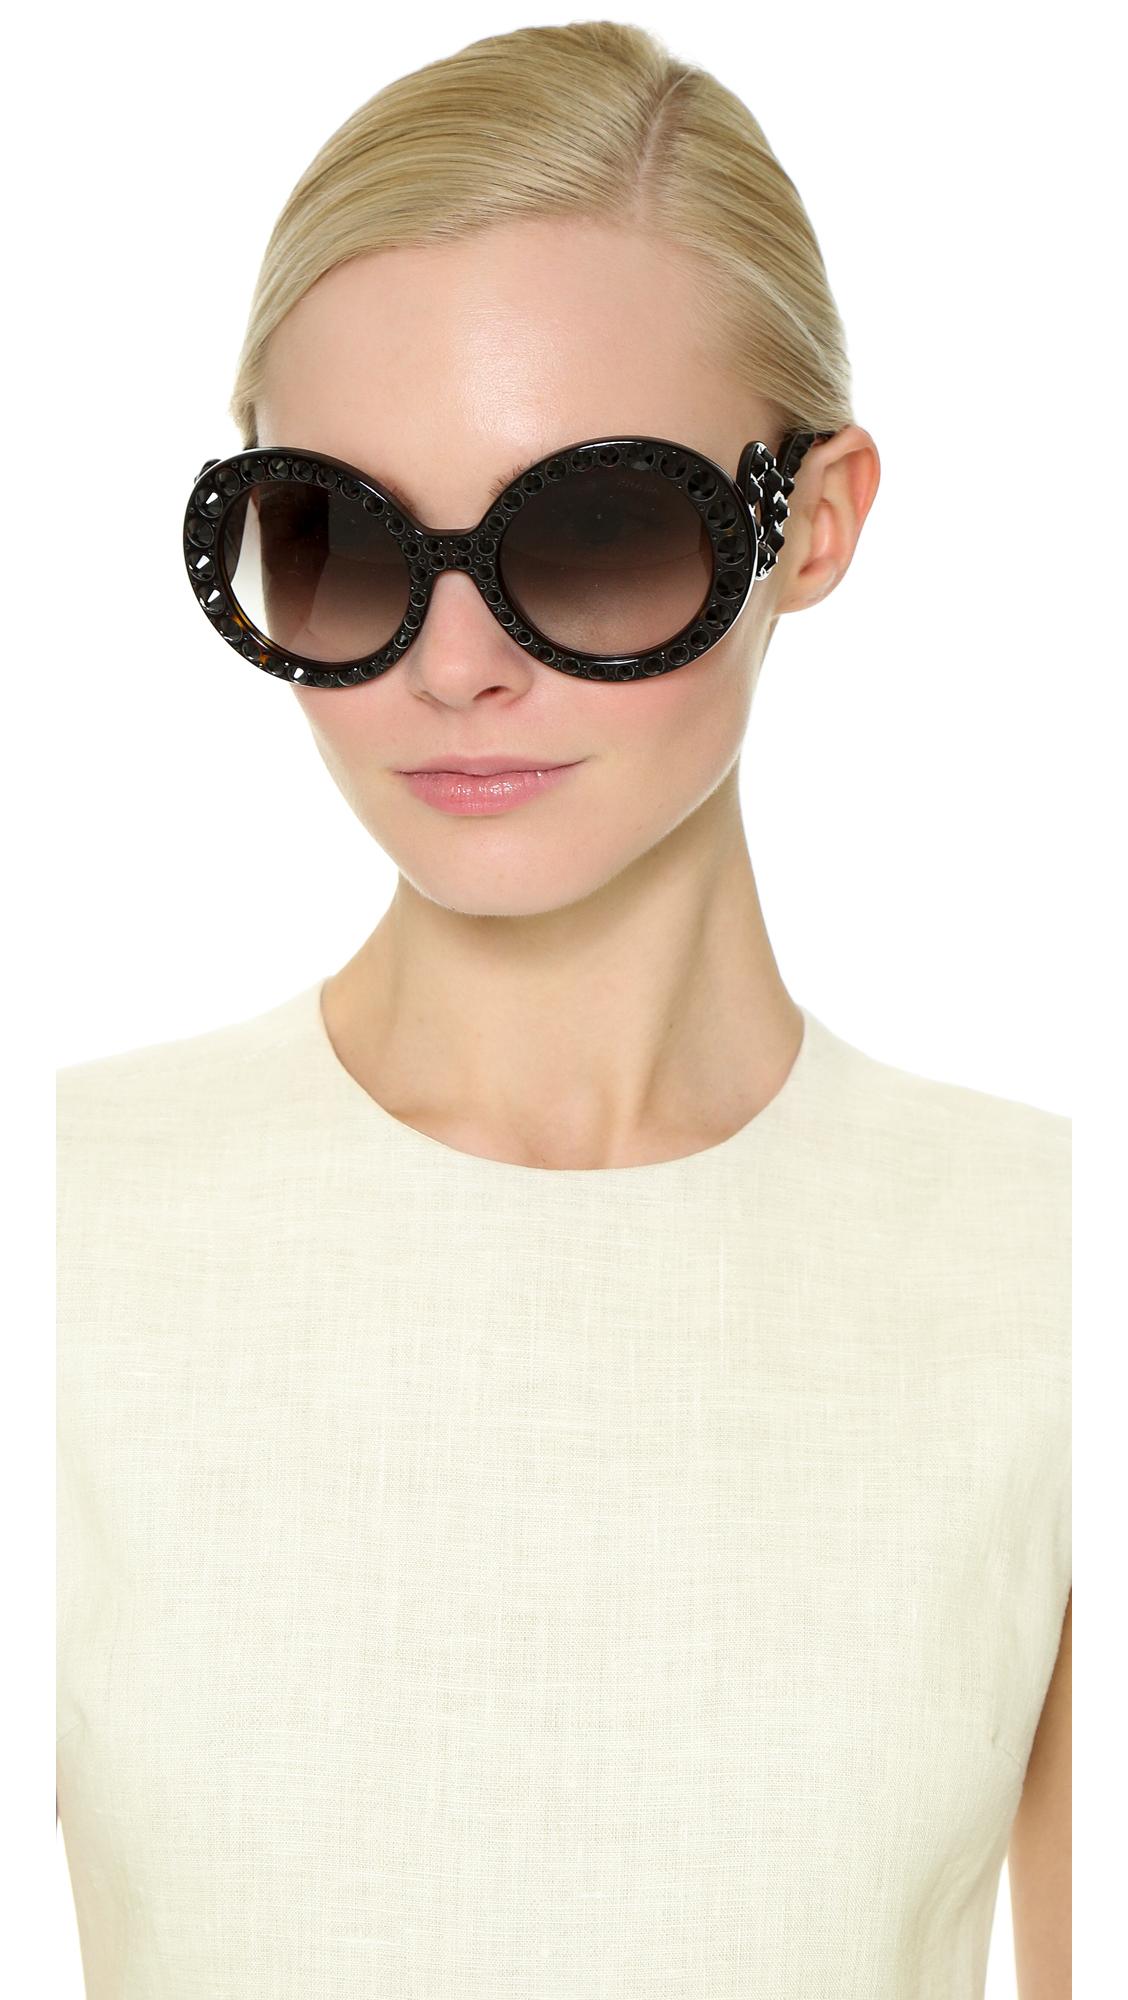 2fef20c4dc ... where to buy lyst prada studded round sunglasses havana grey gradient  in gray 147e6 3a511